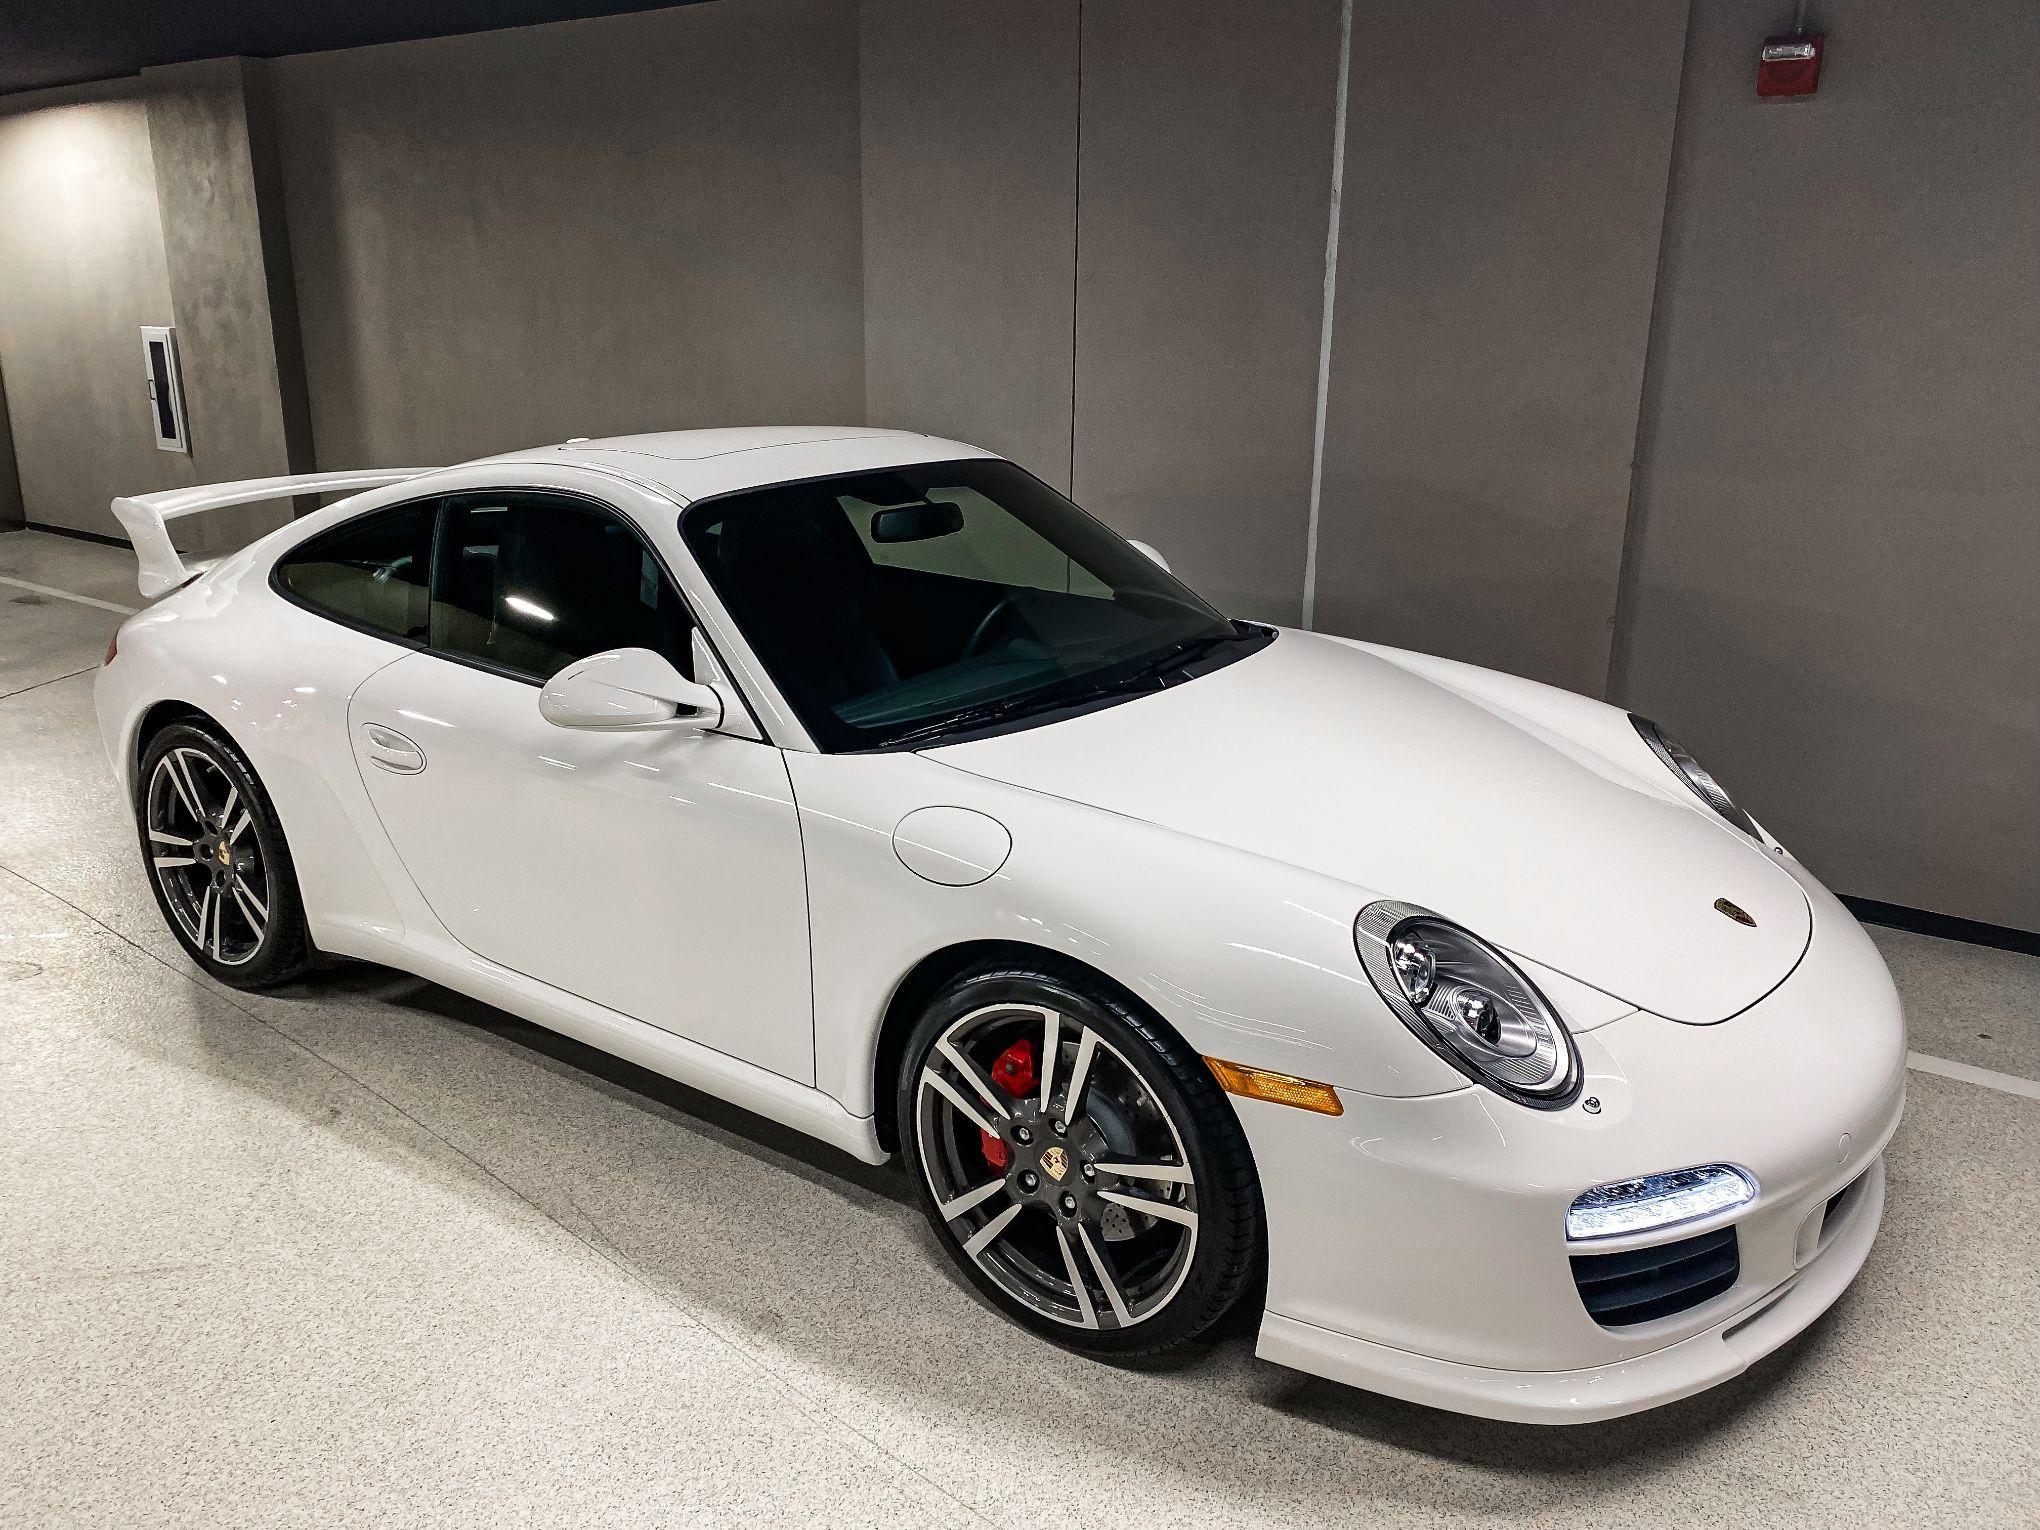 2012 Porsche 997.2 Carrera S Aerokit 6-Speed